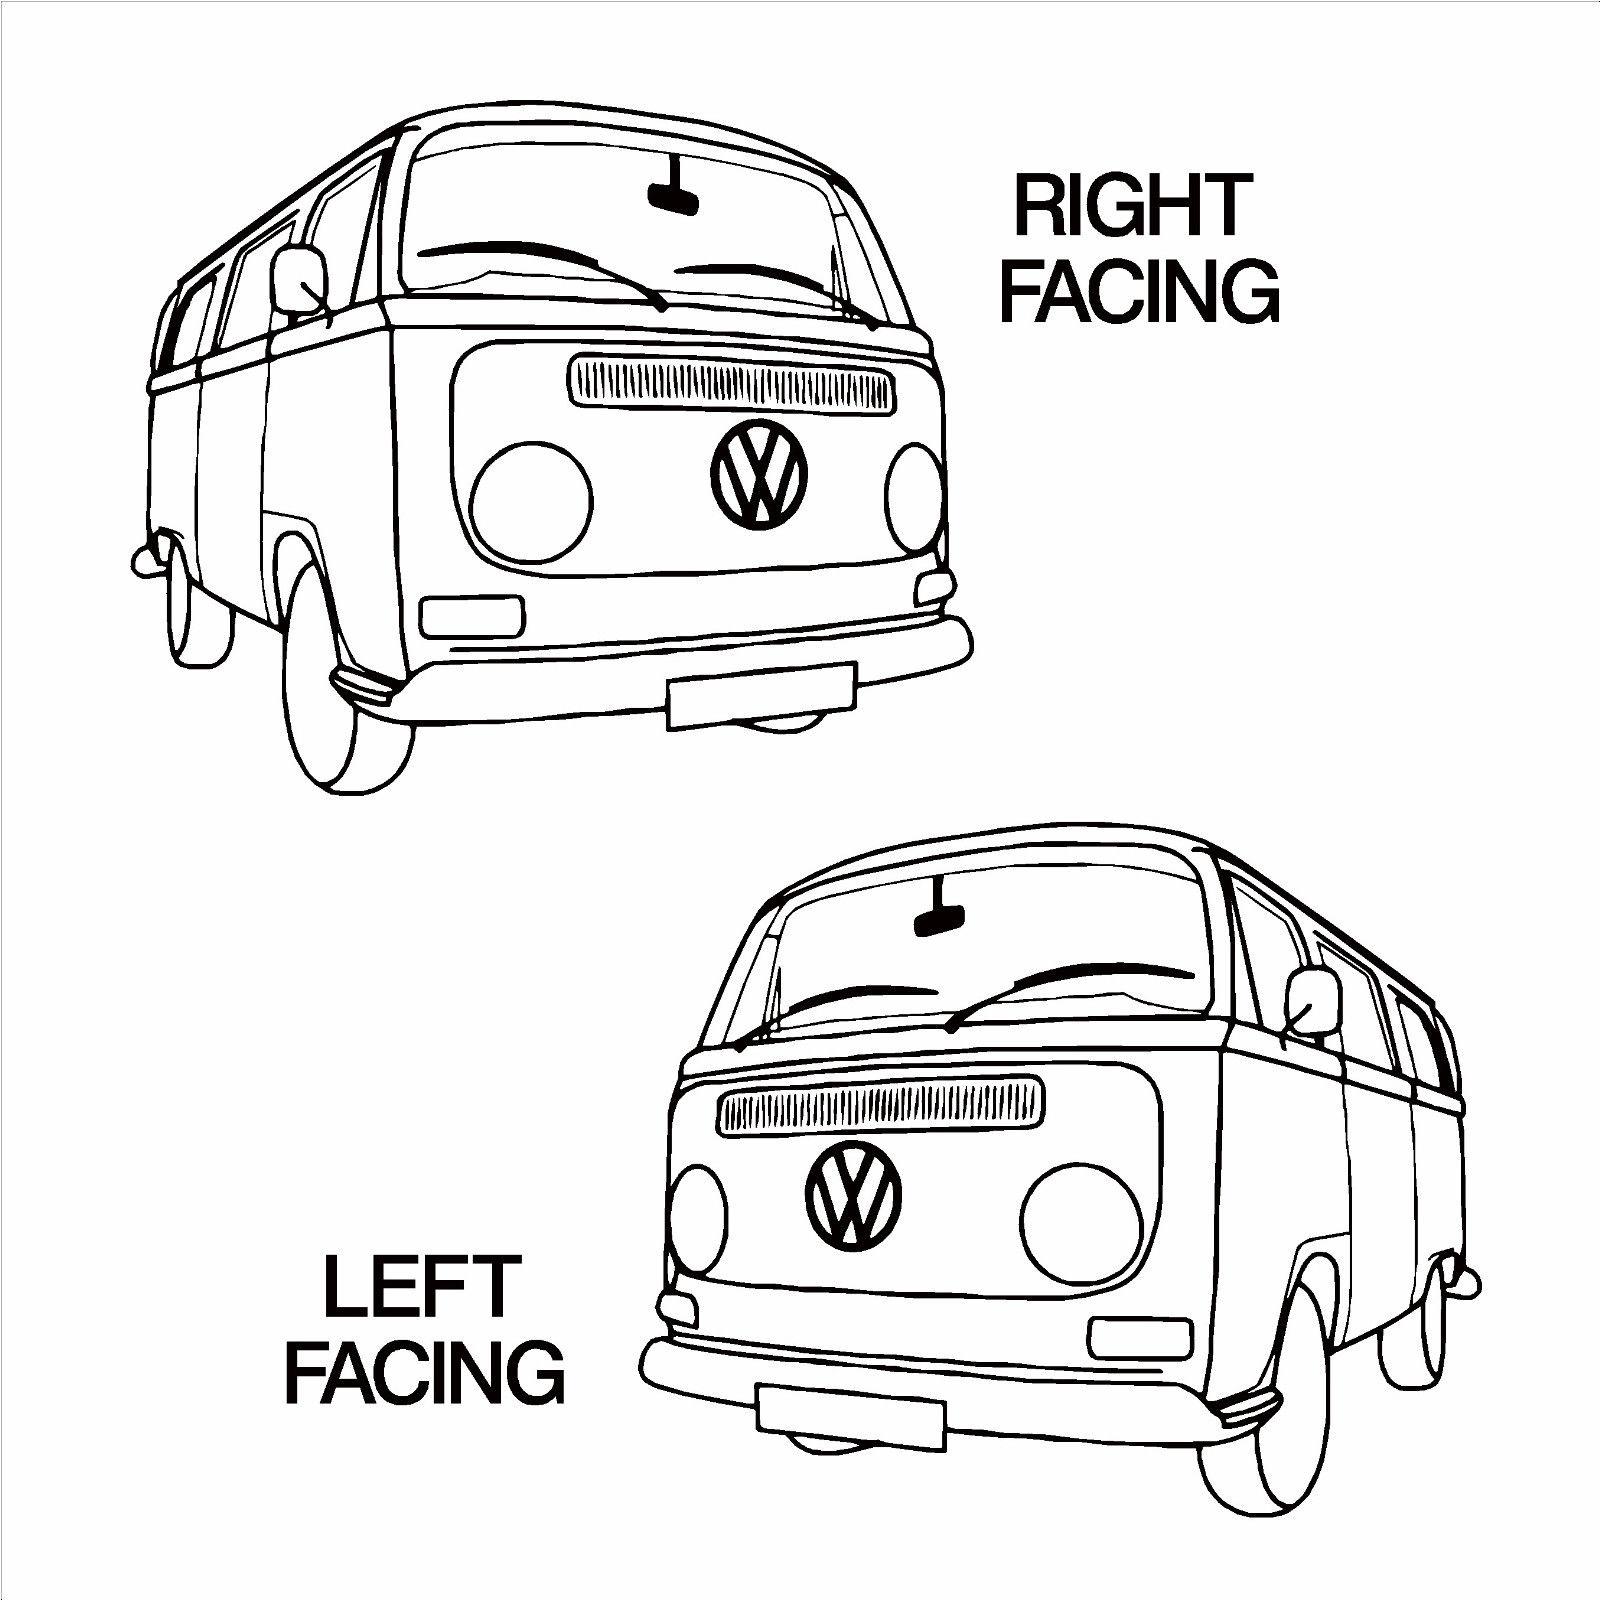 vw van drawing at getdrawings com